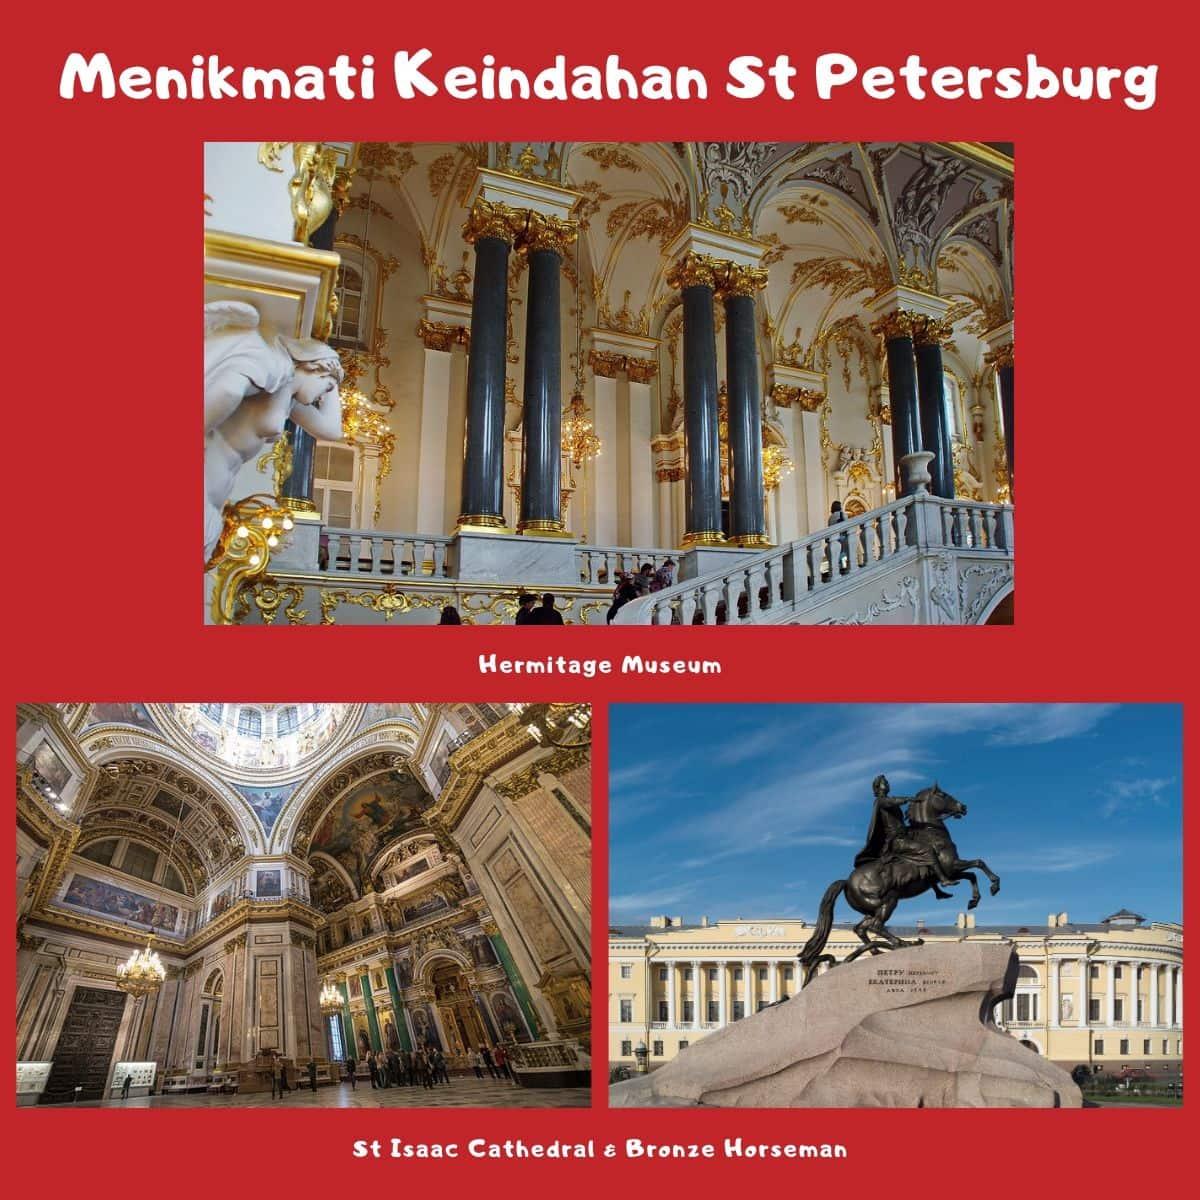 Rekomendasi Wisata di St Petersburg - Hermitage Museum, St Isaac Cathedral, & Bronze Horseman - Sumber Pixabay, Wikipedia, & Wikimedia